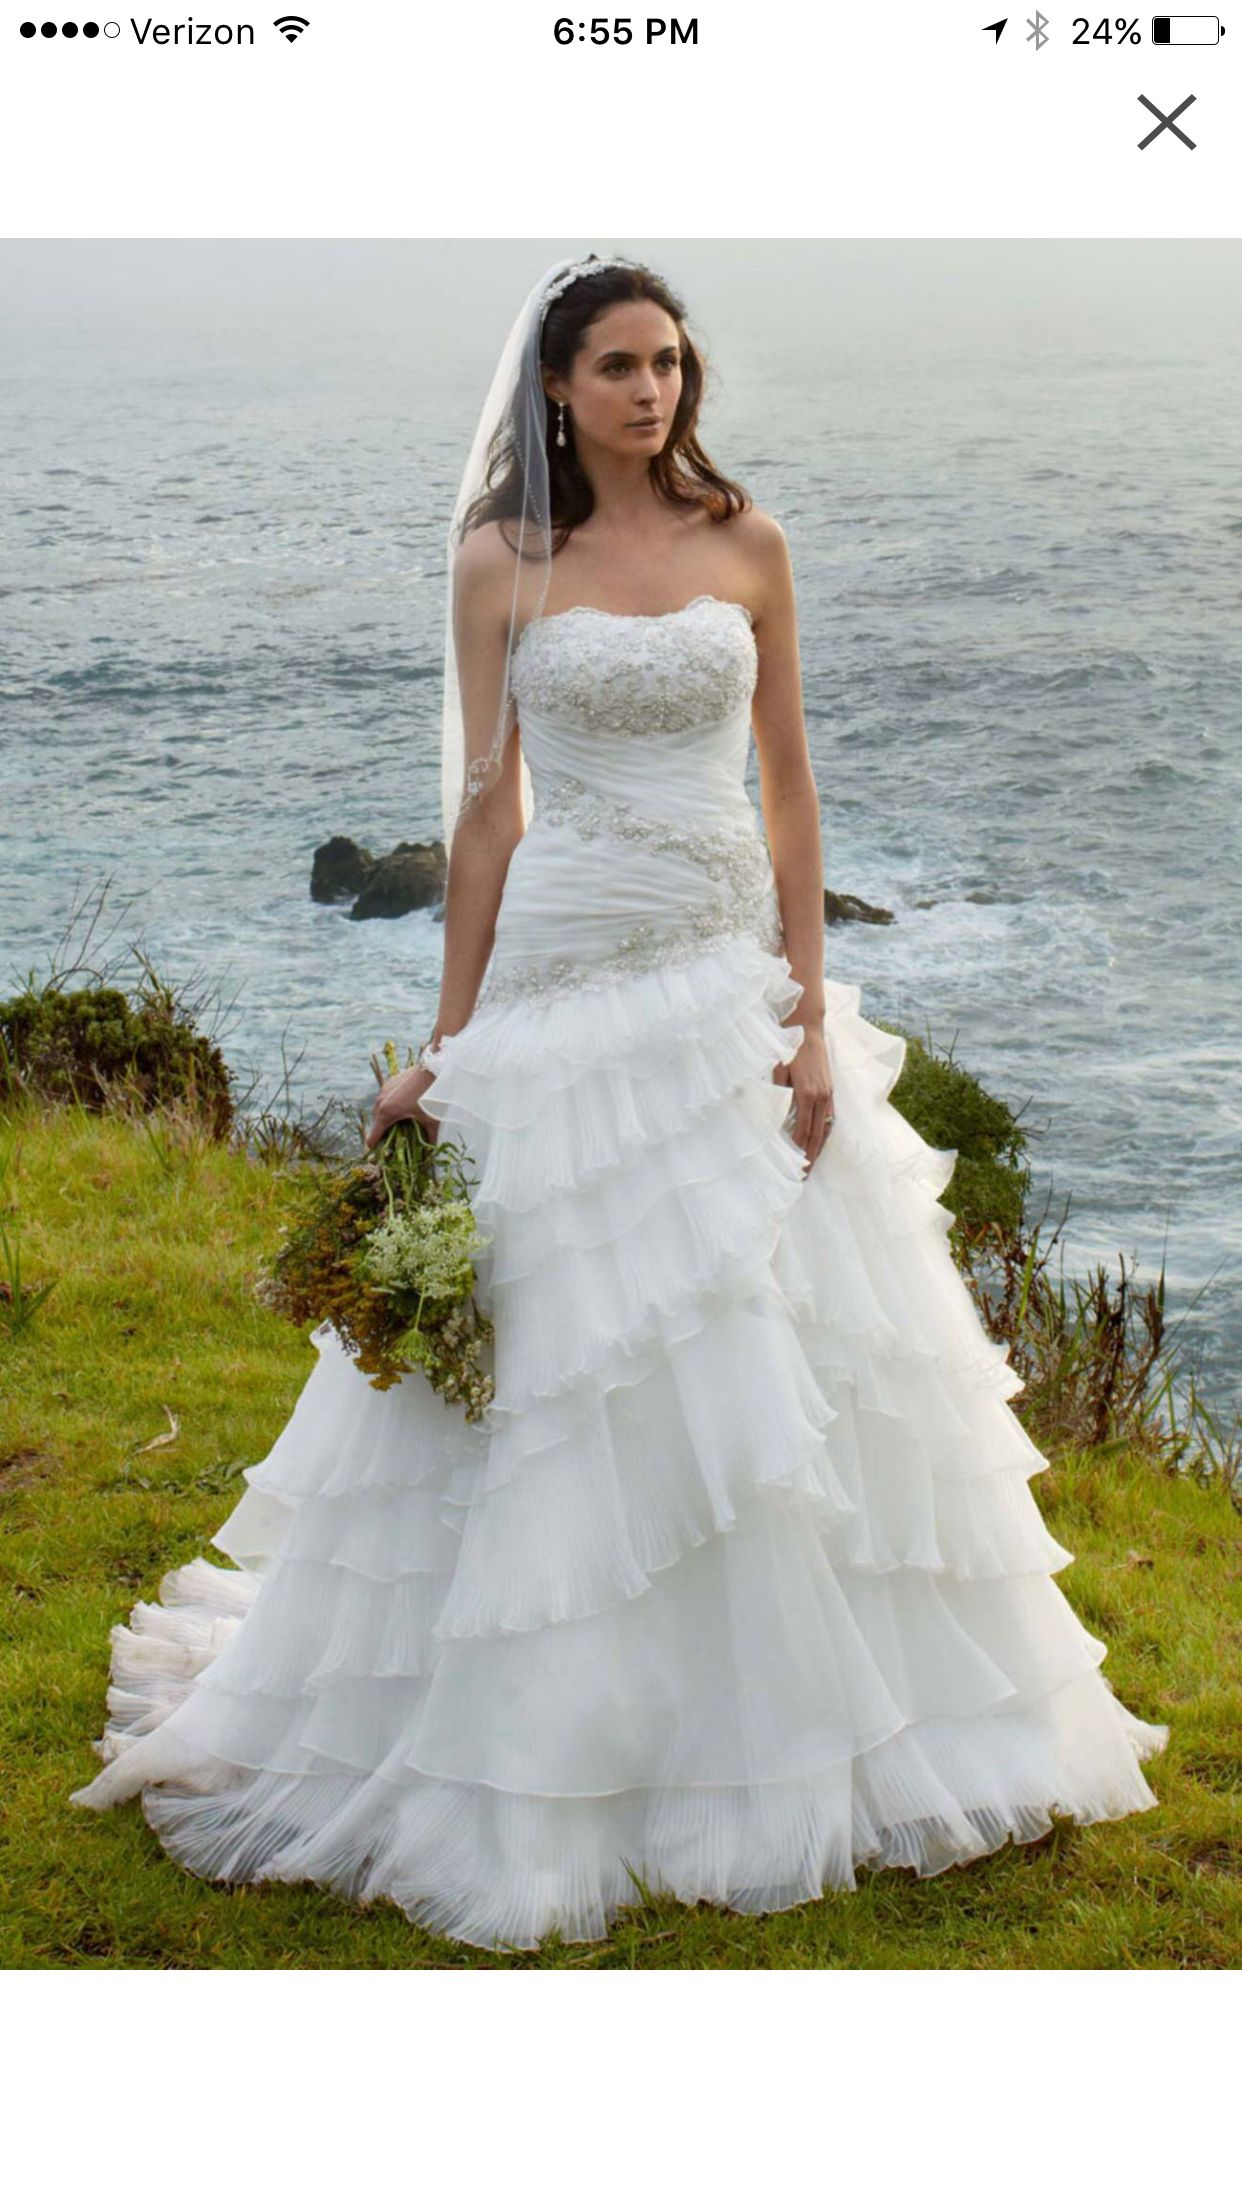 David wedding dress  Pin by Hannah Loudner on Wedding   Pinterest  Wedding